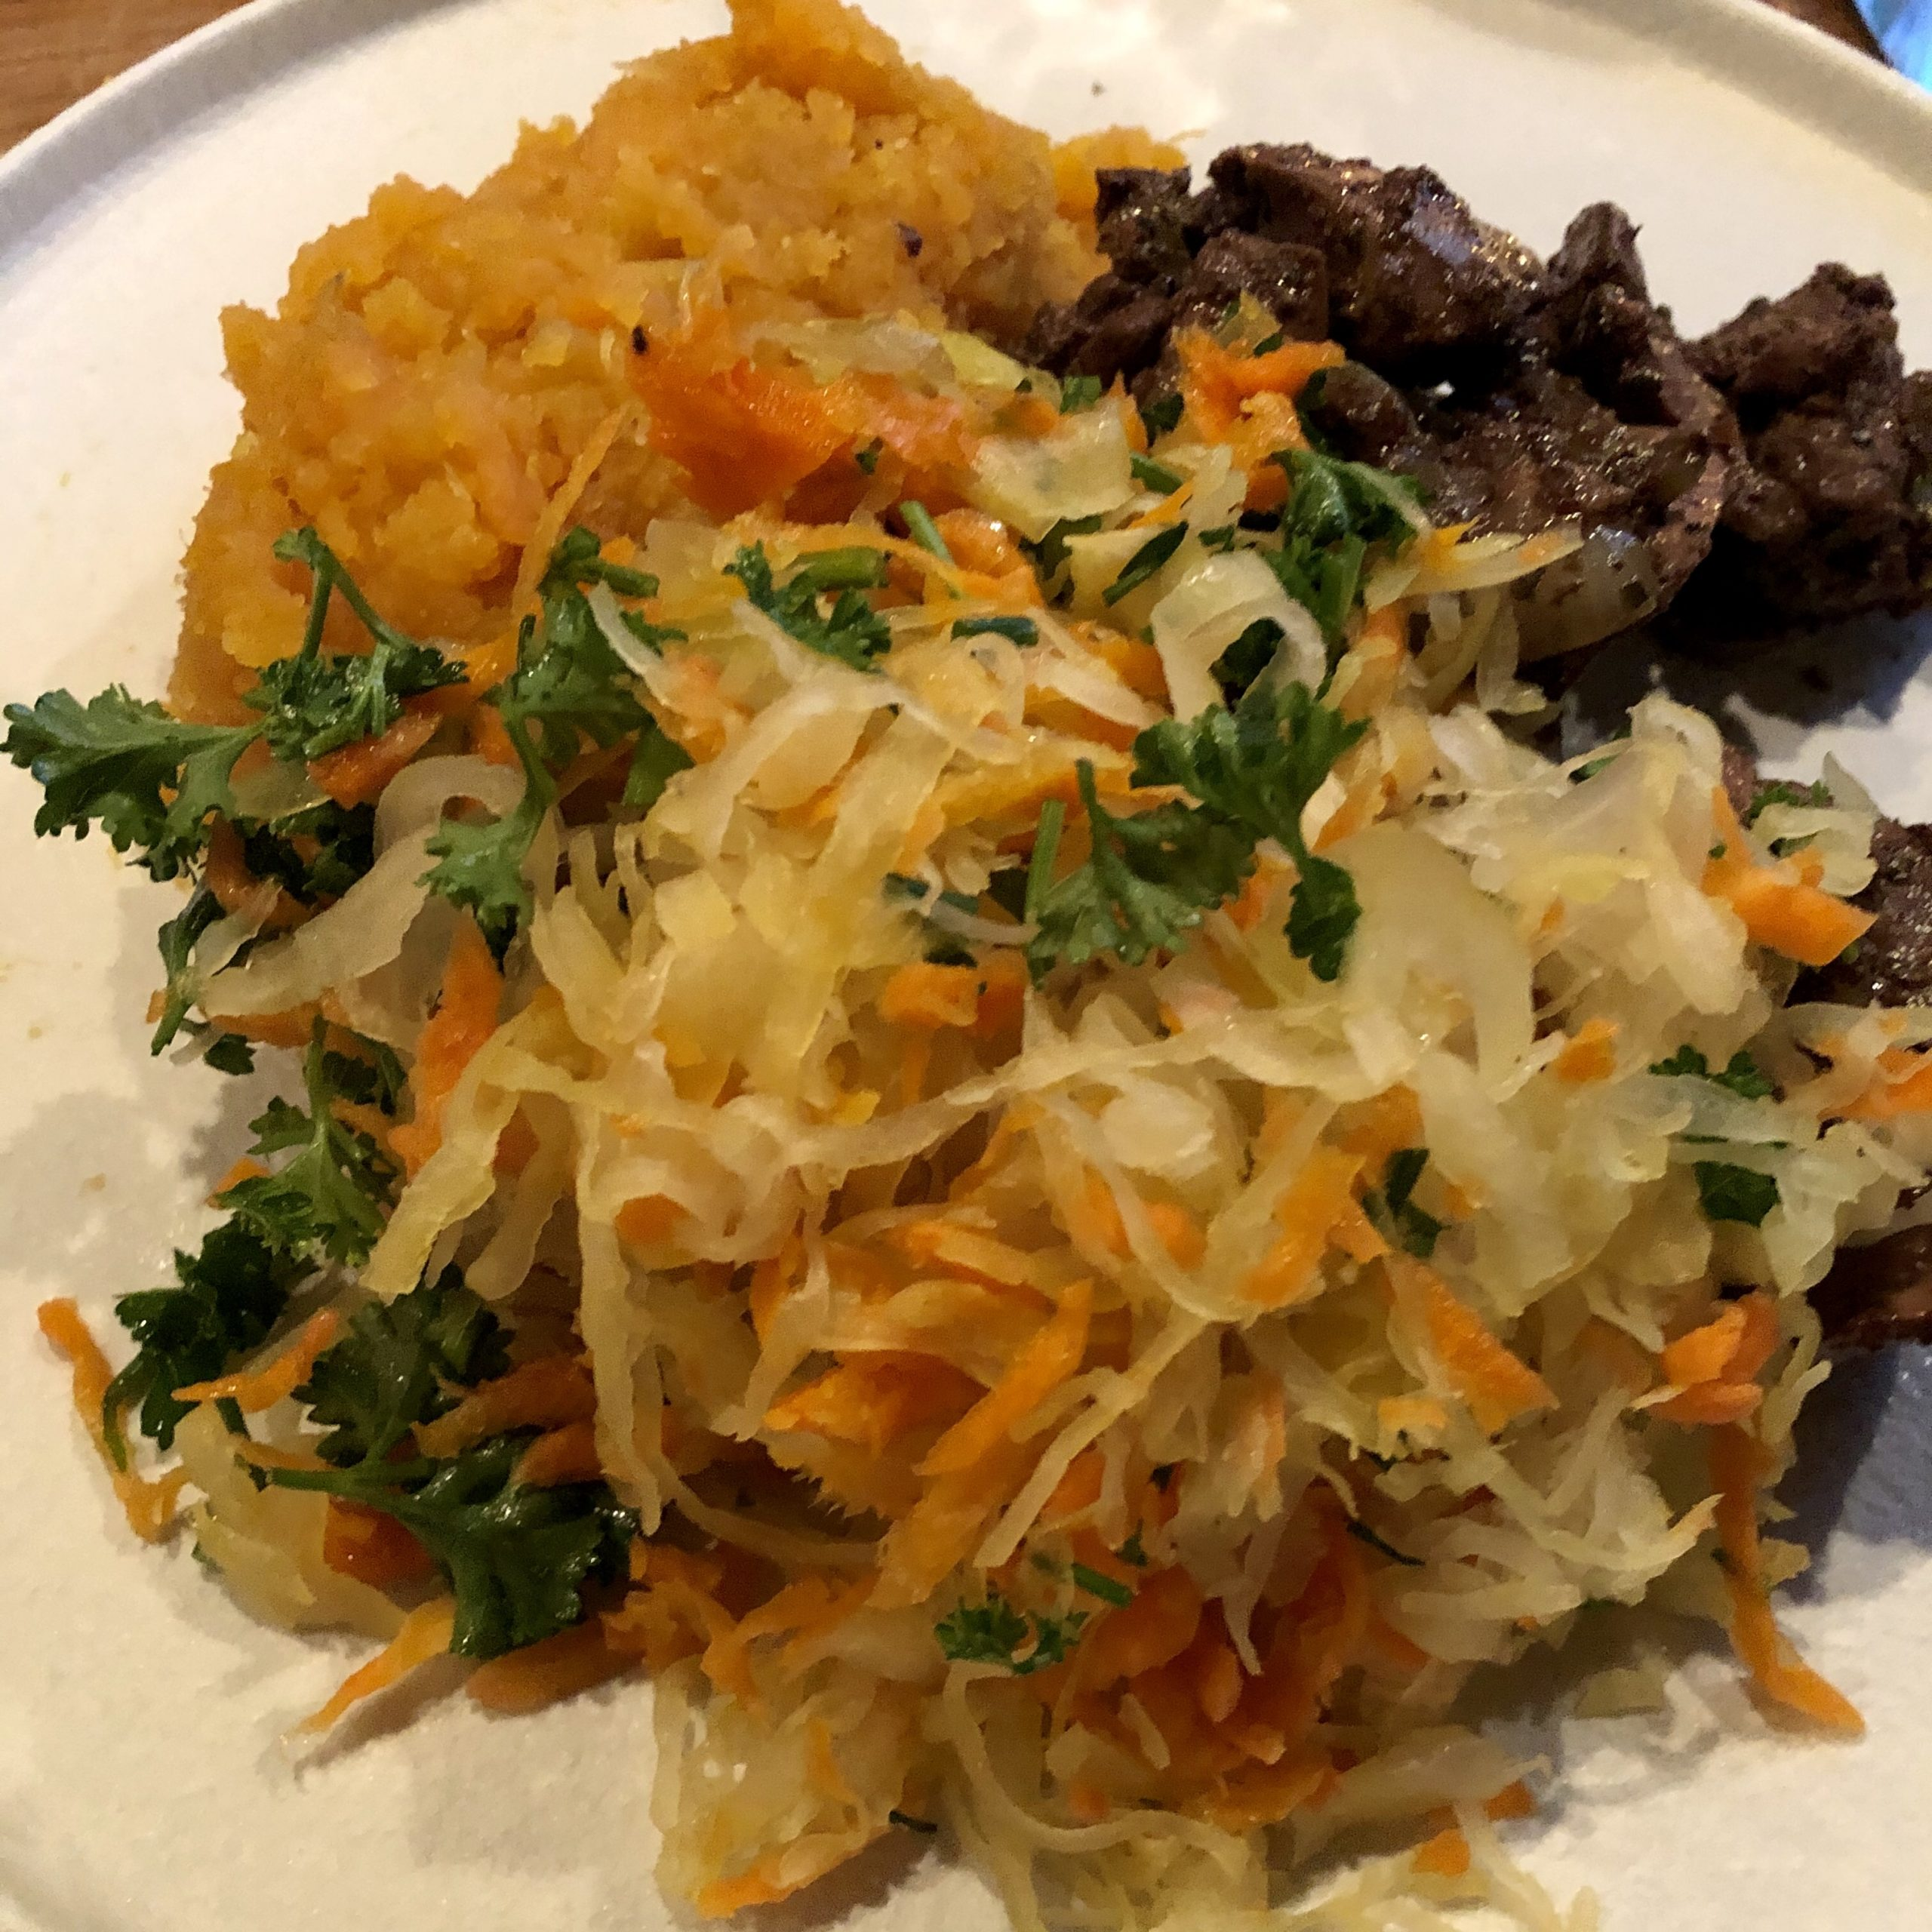 Corona lockdown dag 14: Kippenlevertjes, Poolse zuurkool salade en zoete aardappelpuree